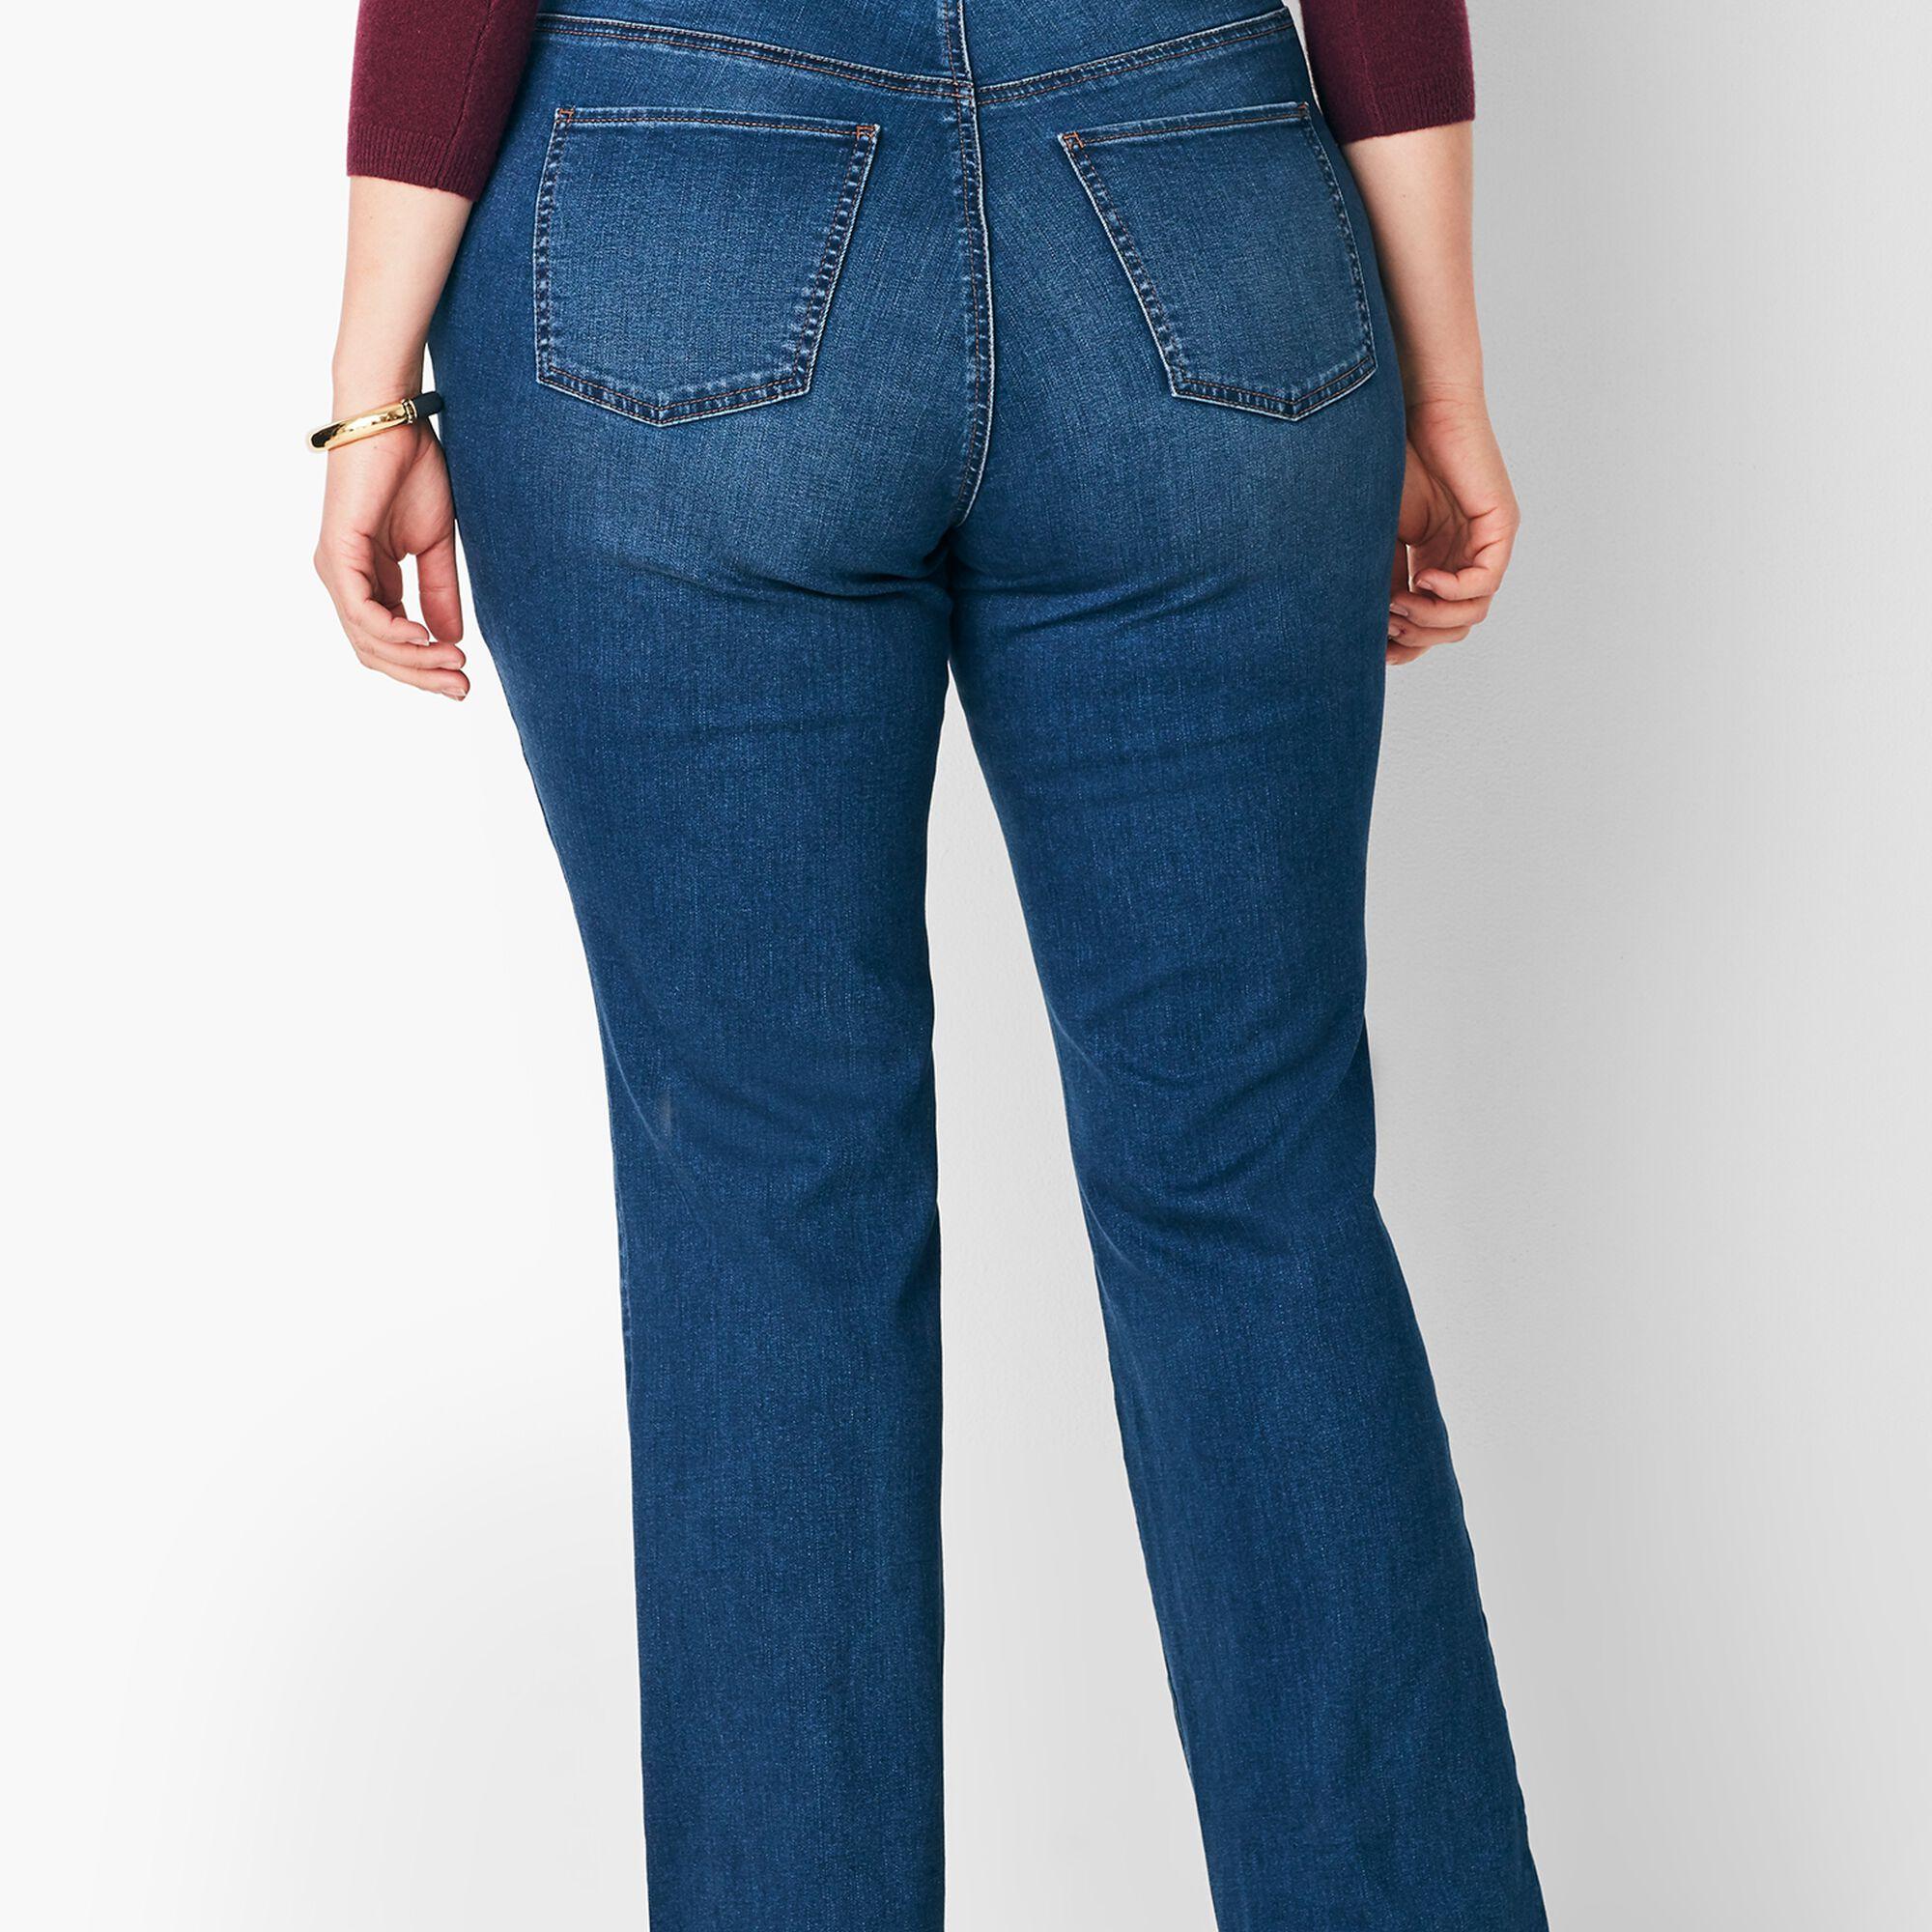 823a6b2da09 Plus Size High-Waist Barely Boot Jeans - Nestor Wash/Curvy Fit